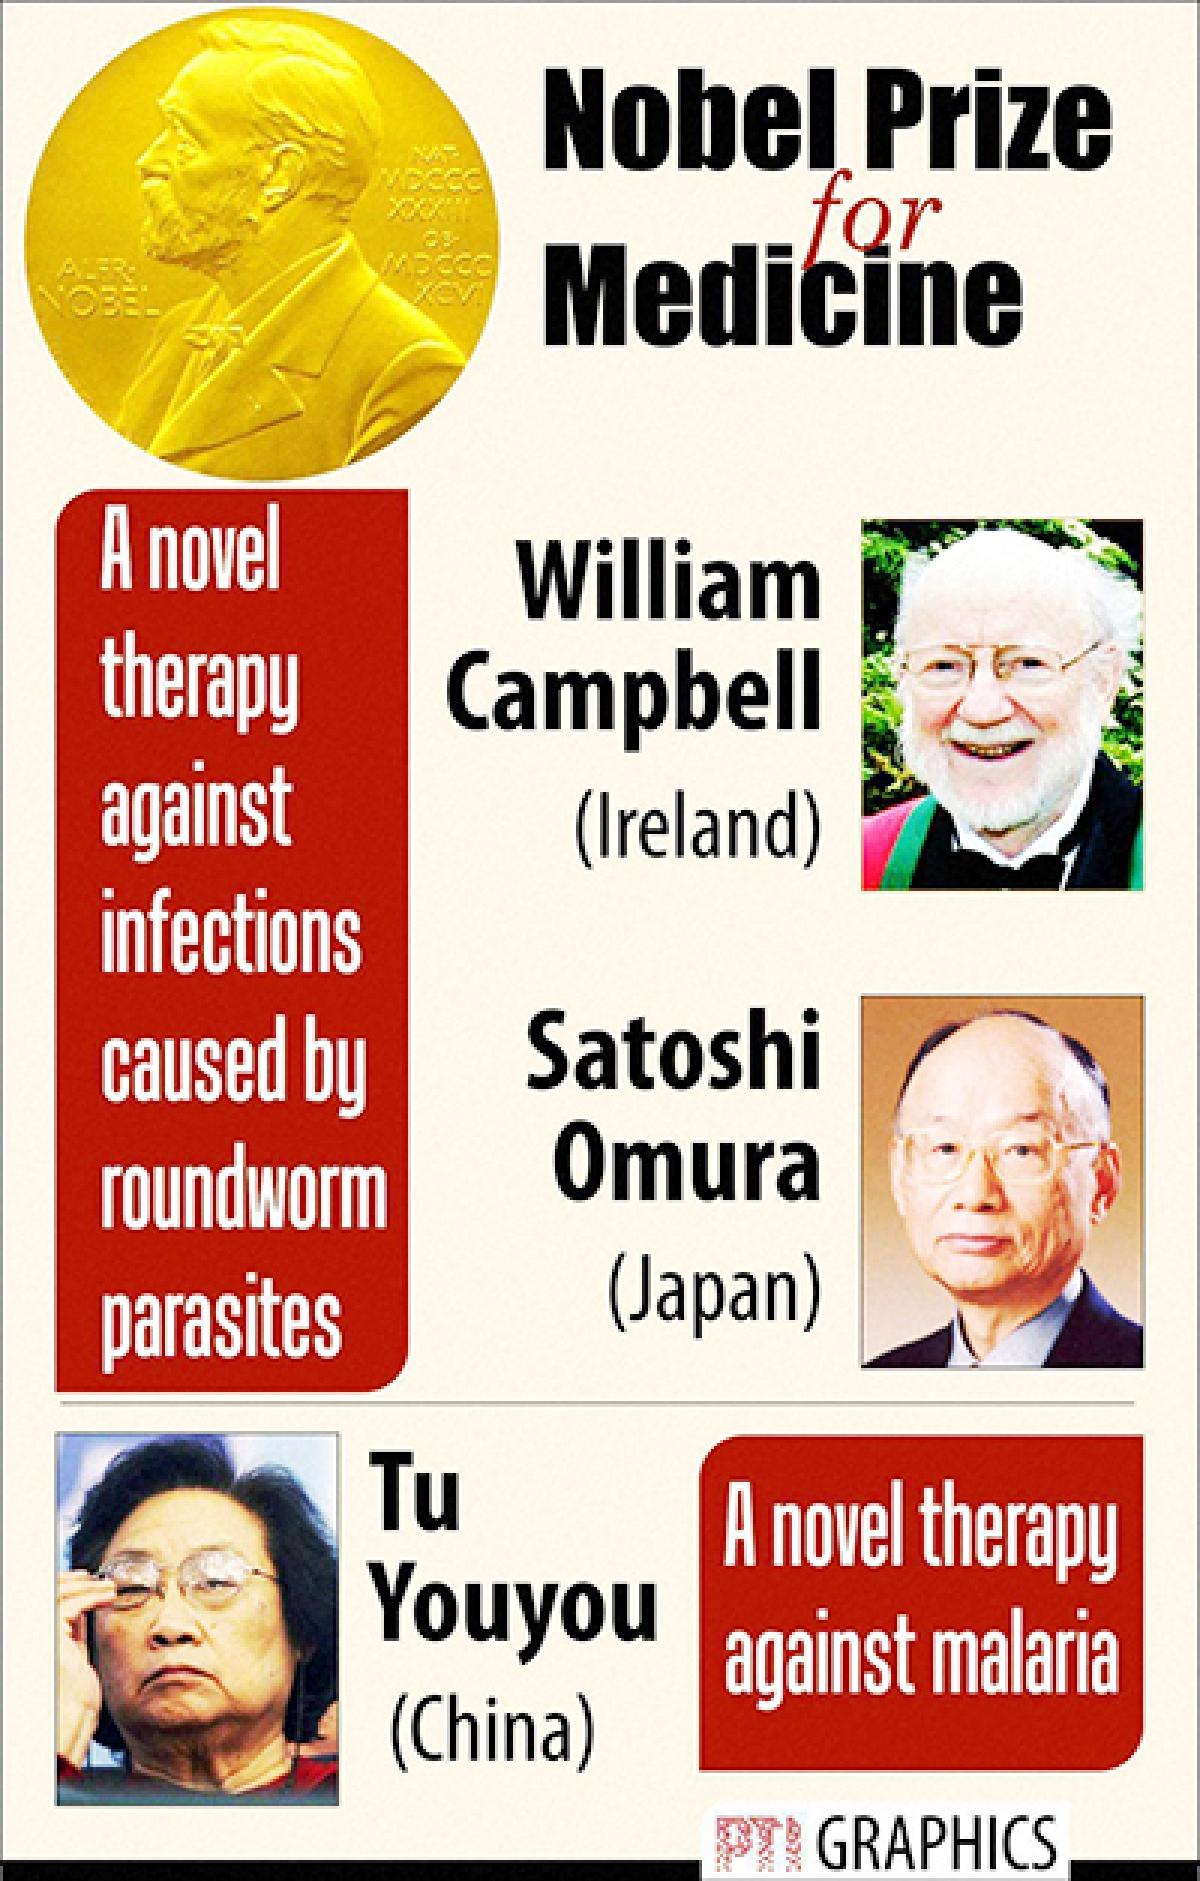 NEW DELHI: Nobel Prize for Medicine. PTI GRAPHICS(PTI10_5_2015_000243B)